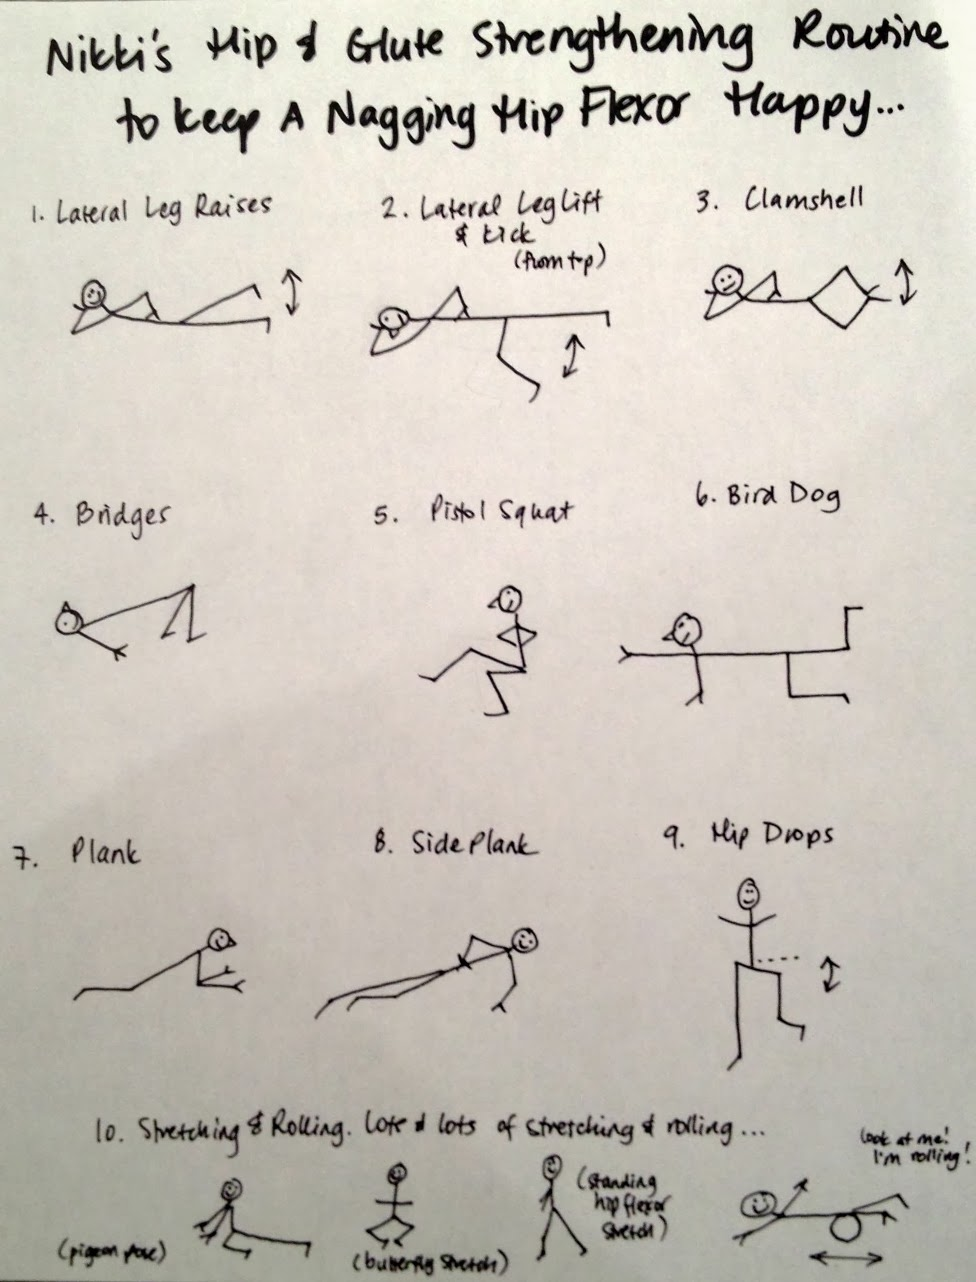 hip flexor strain rowing